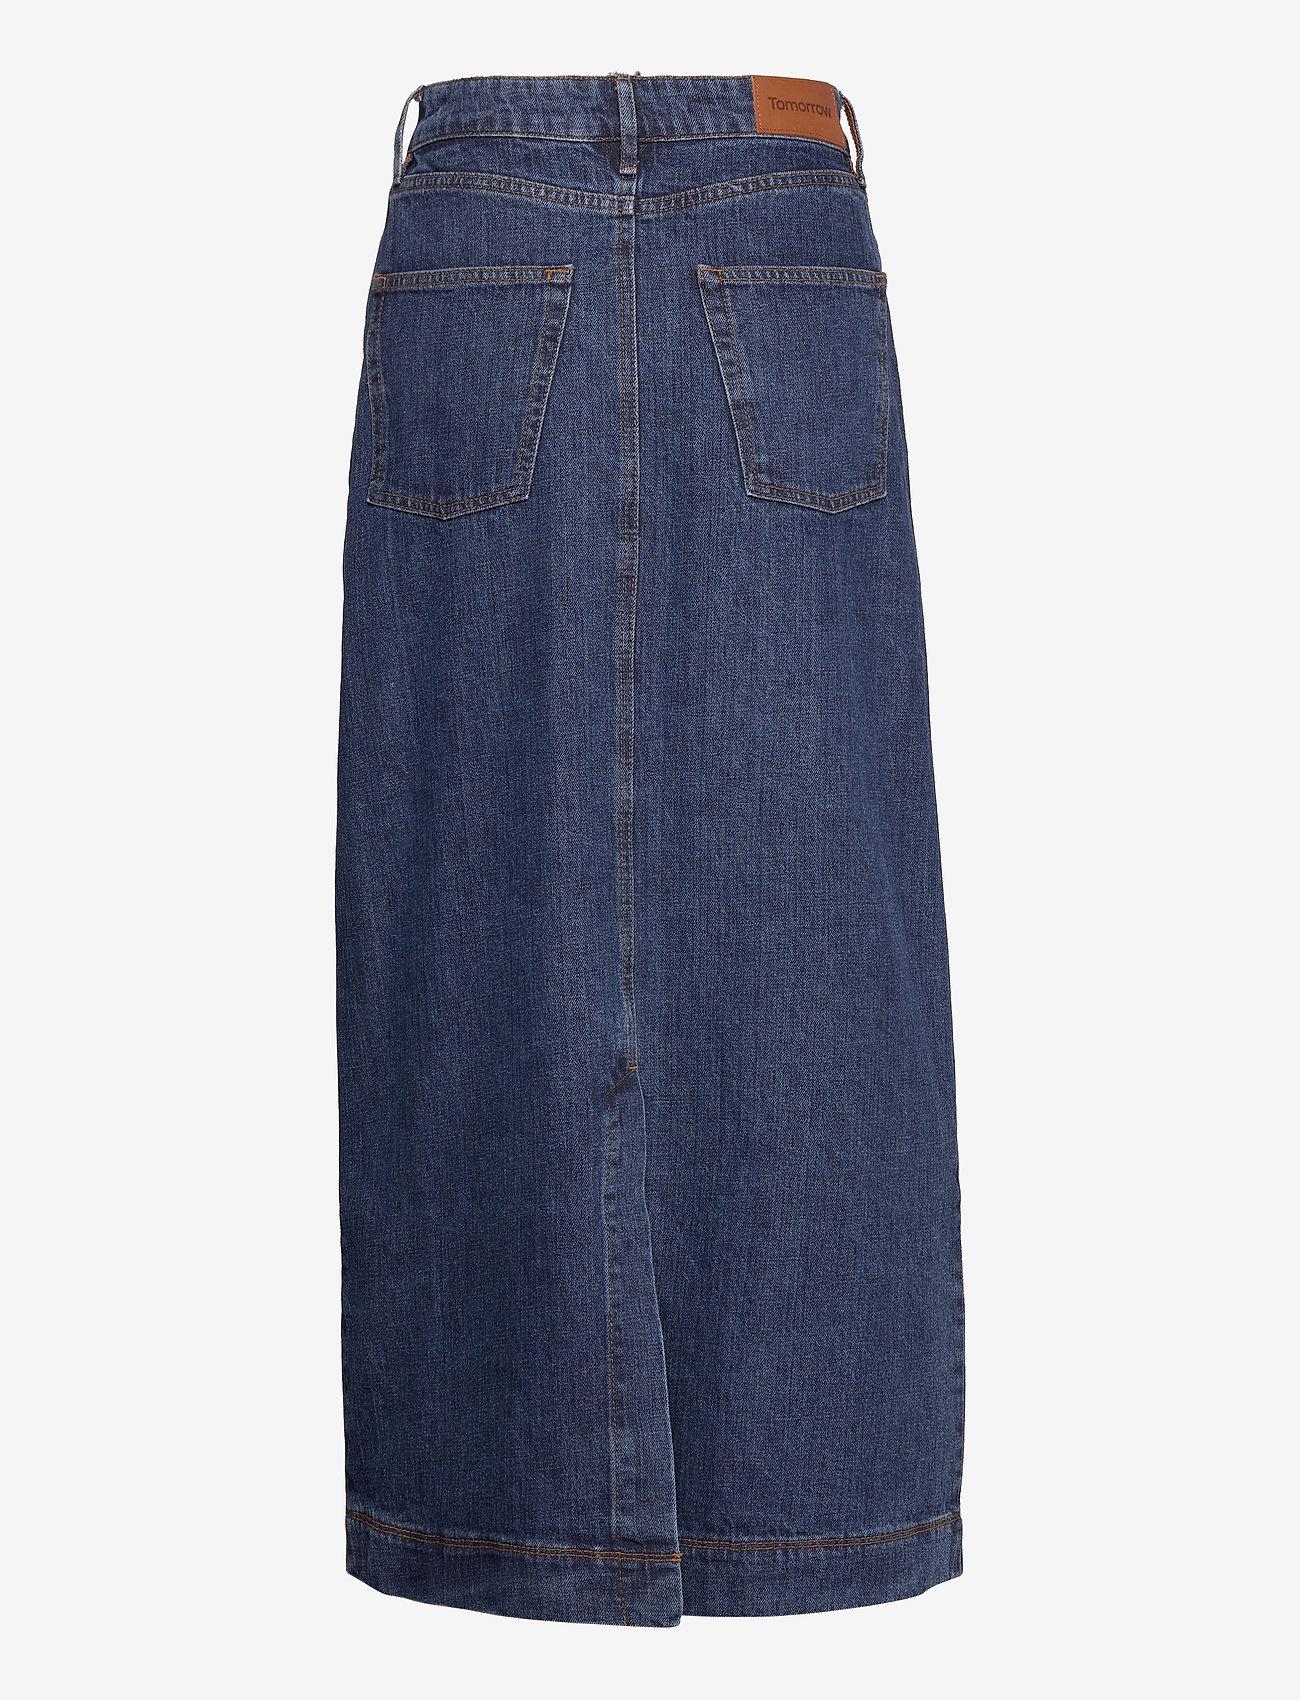 Tomorrow - Mandela maxi skirt wash dark Oxford - denim skirts - denim blue - 3